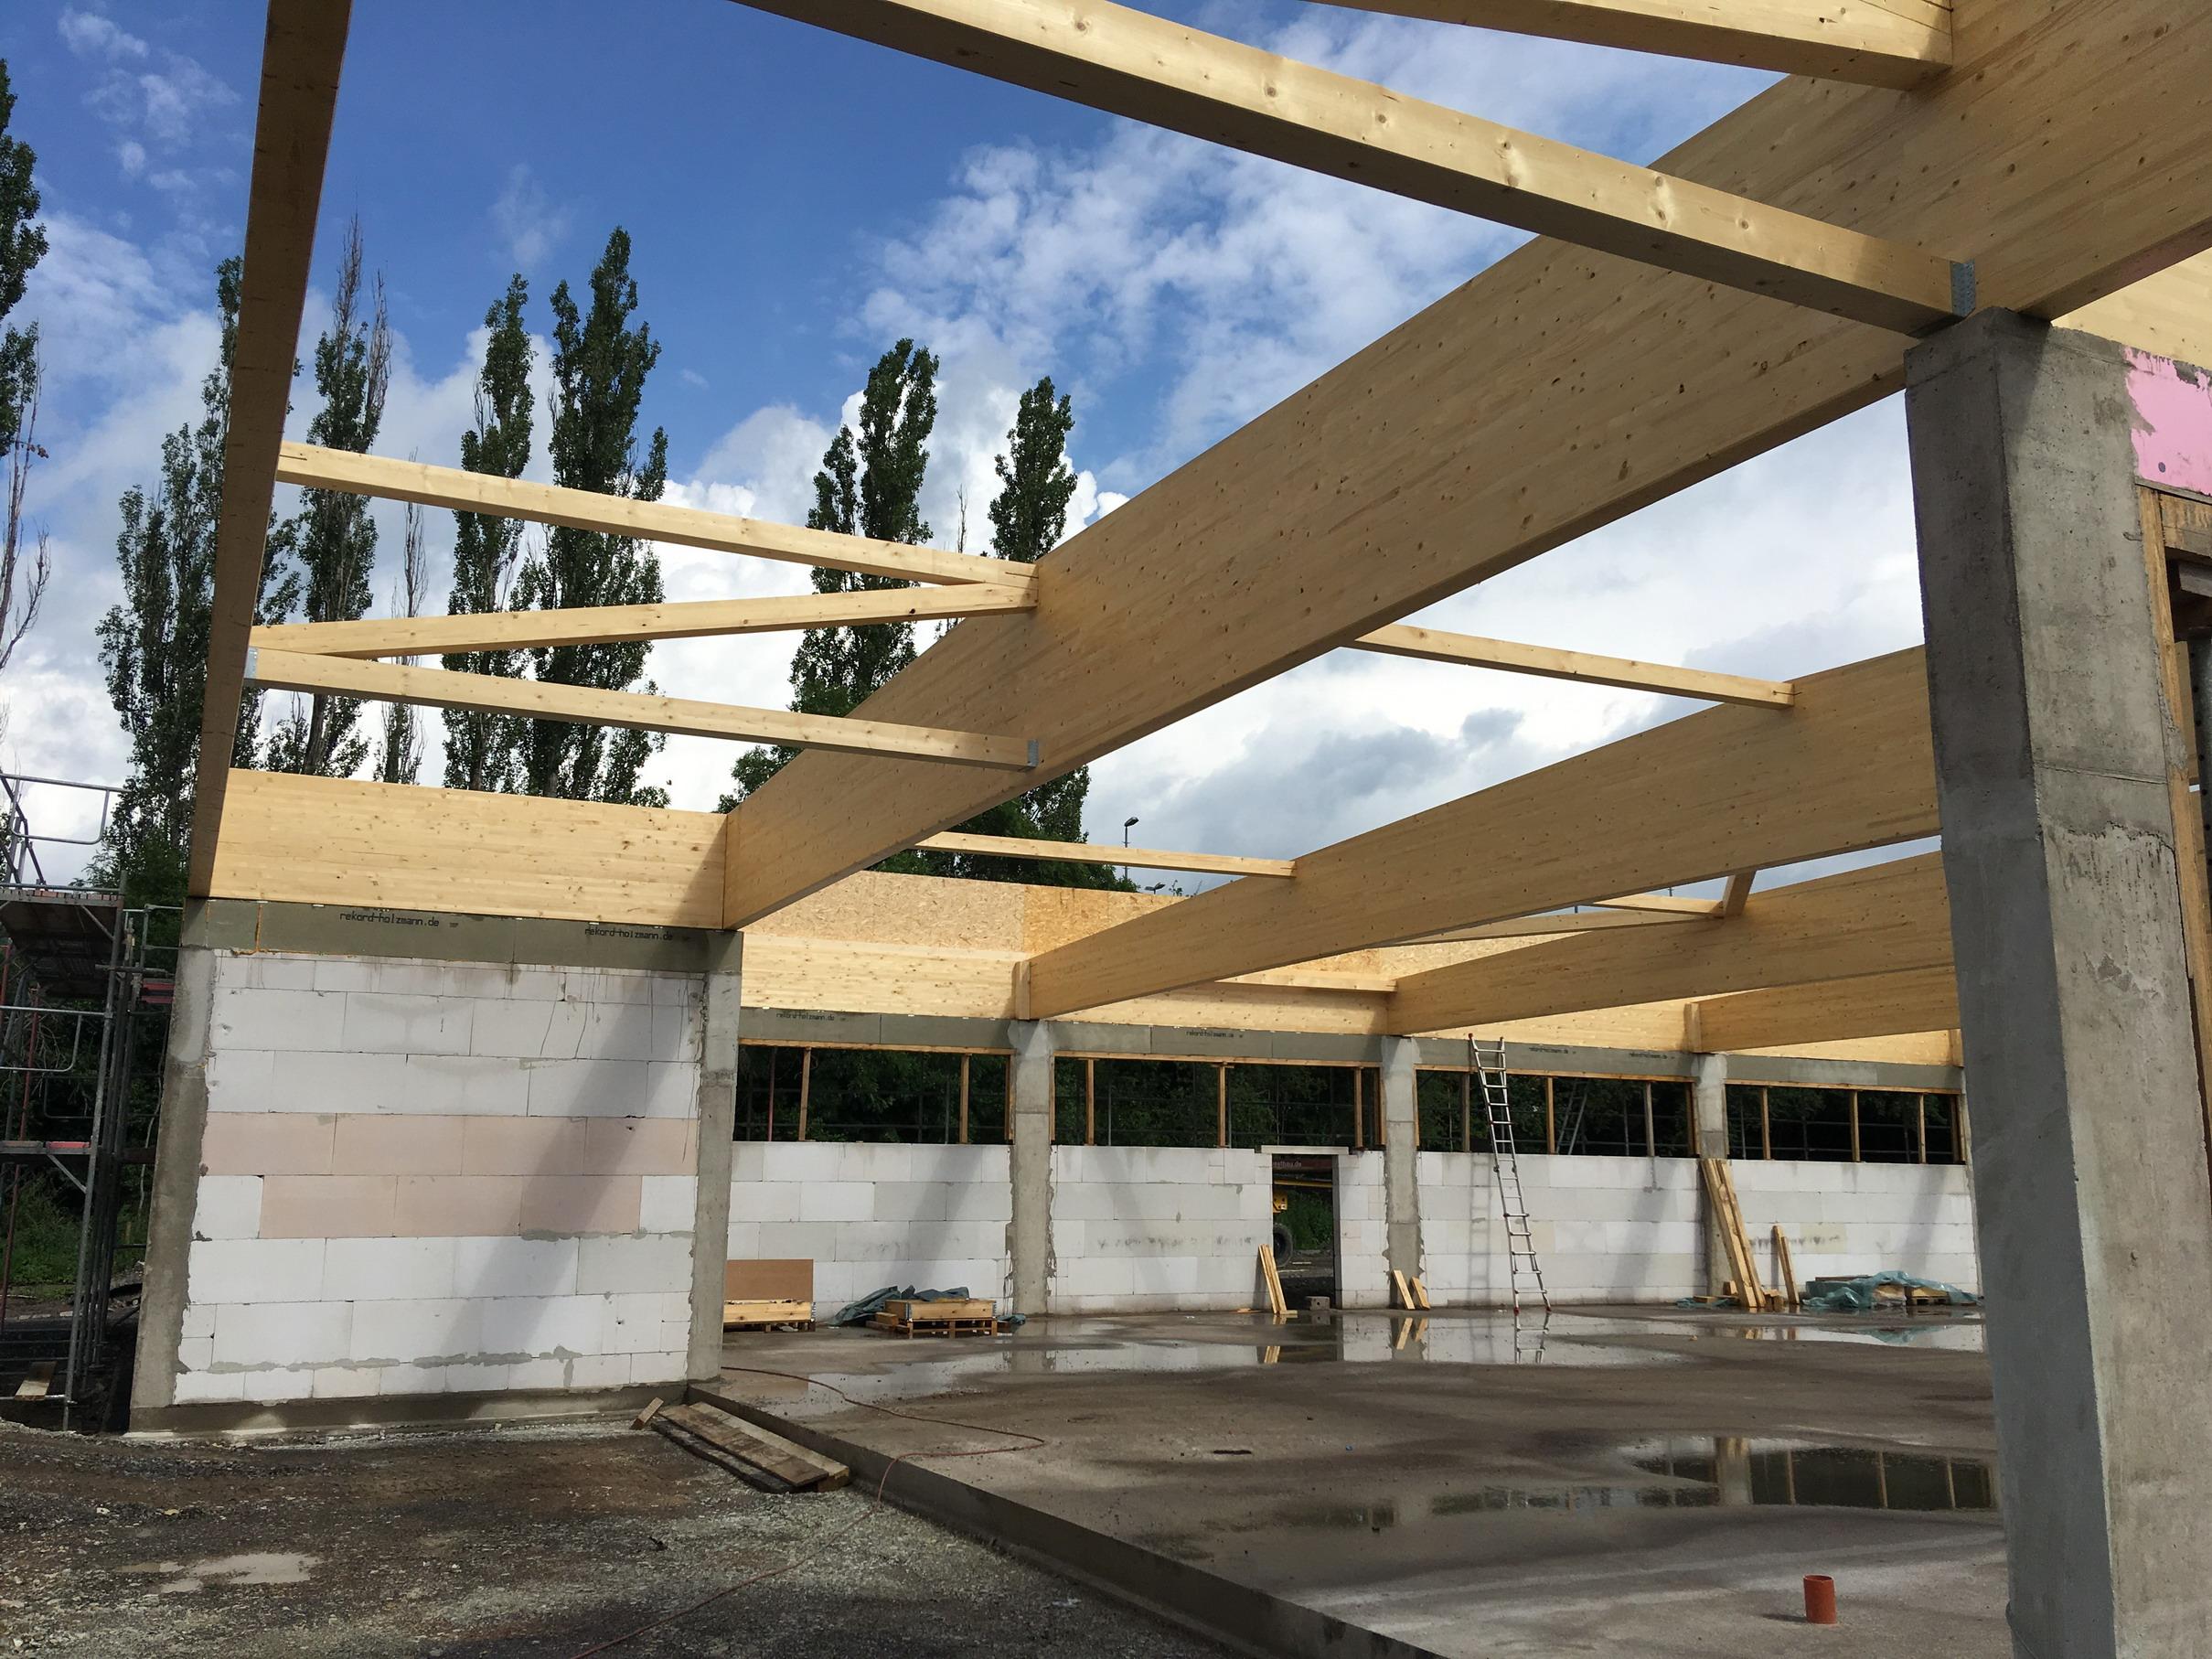 Satteldachbinder Lebensmittelmarkt Verbrauchermarkt Leimholz Dachkonstruktion Holzrahmenbauwandq